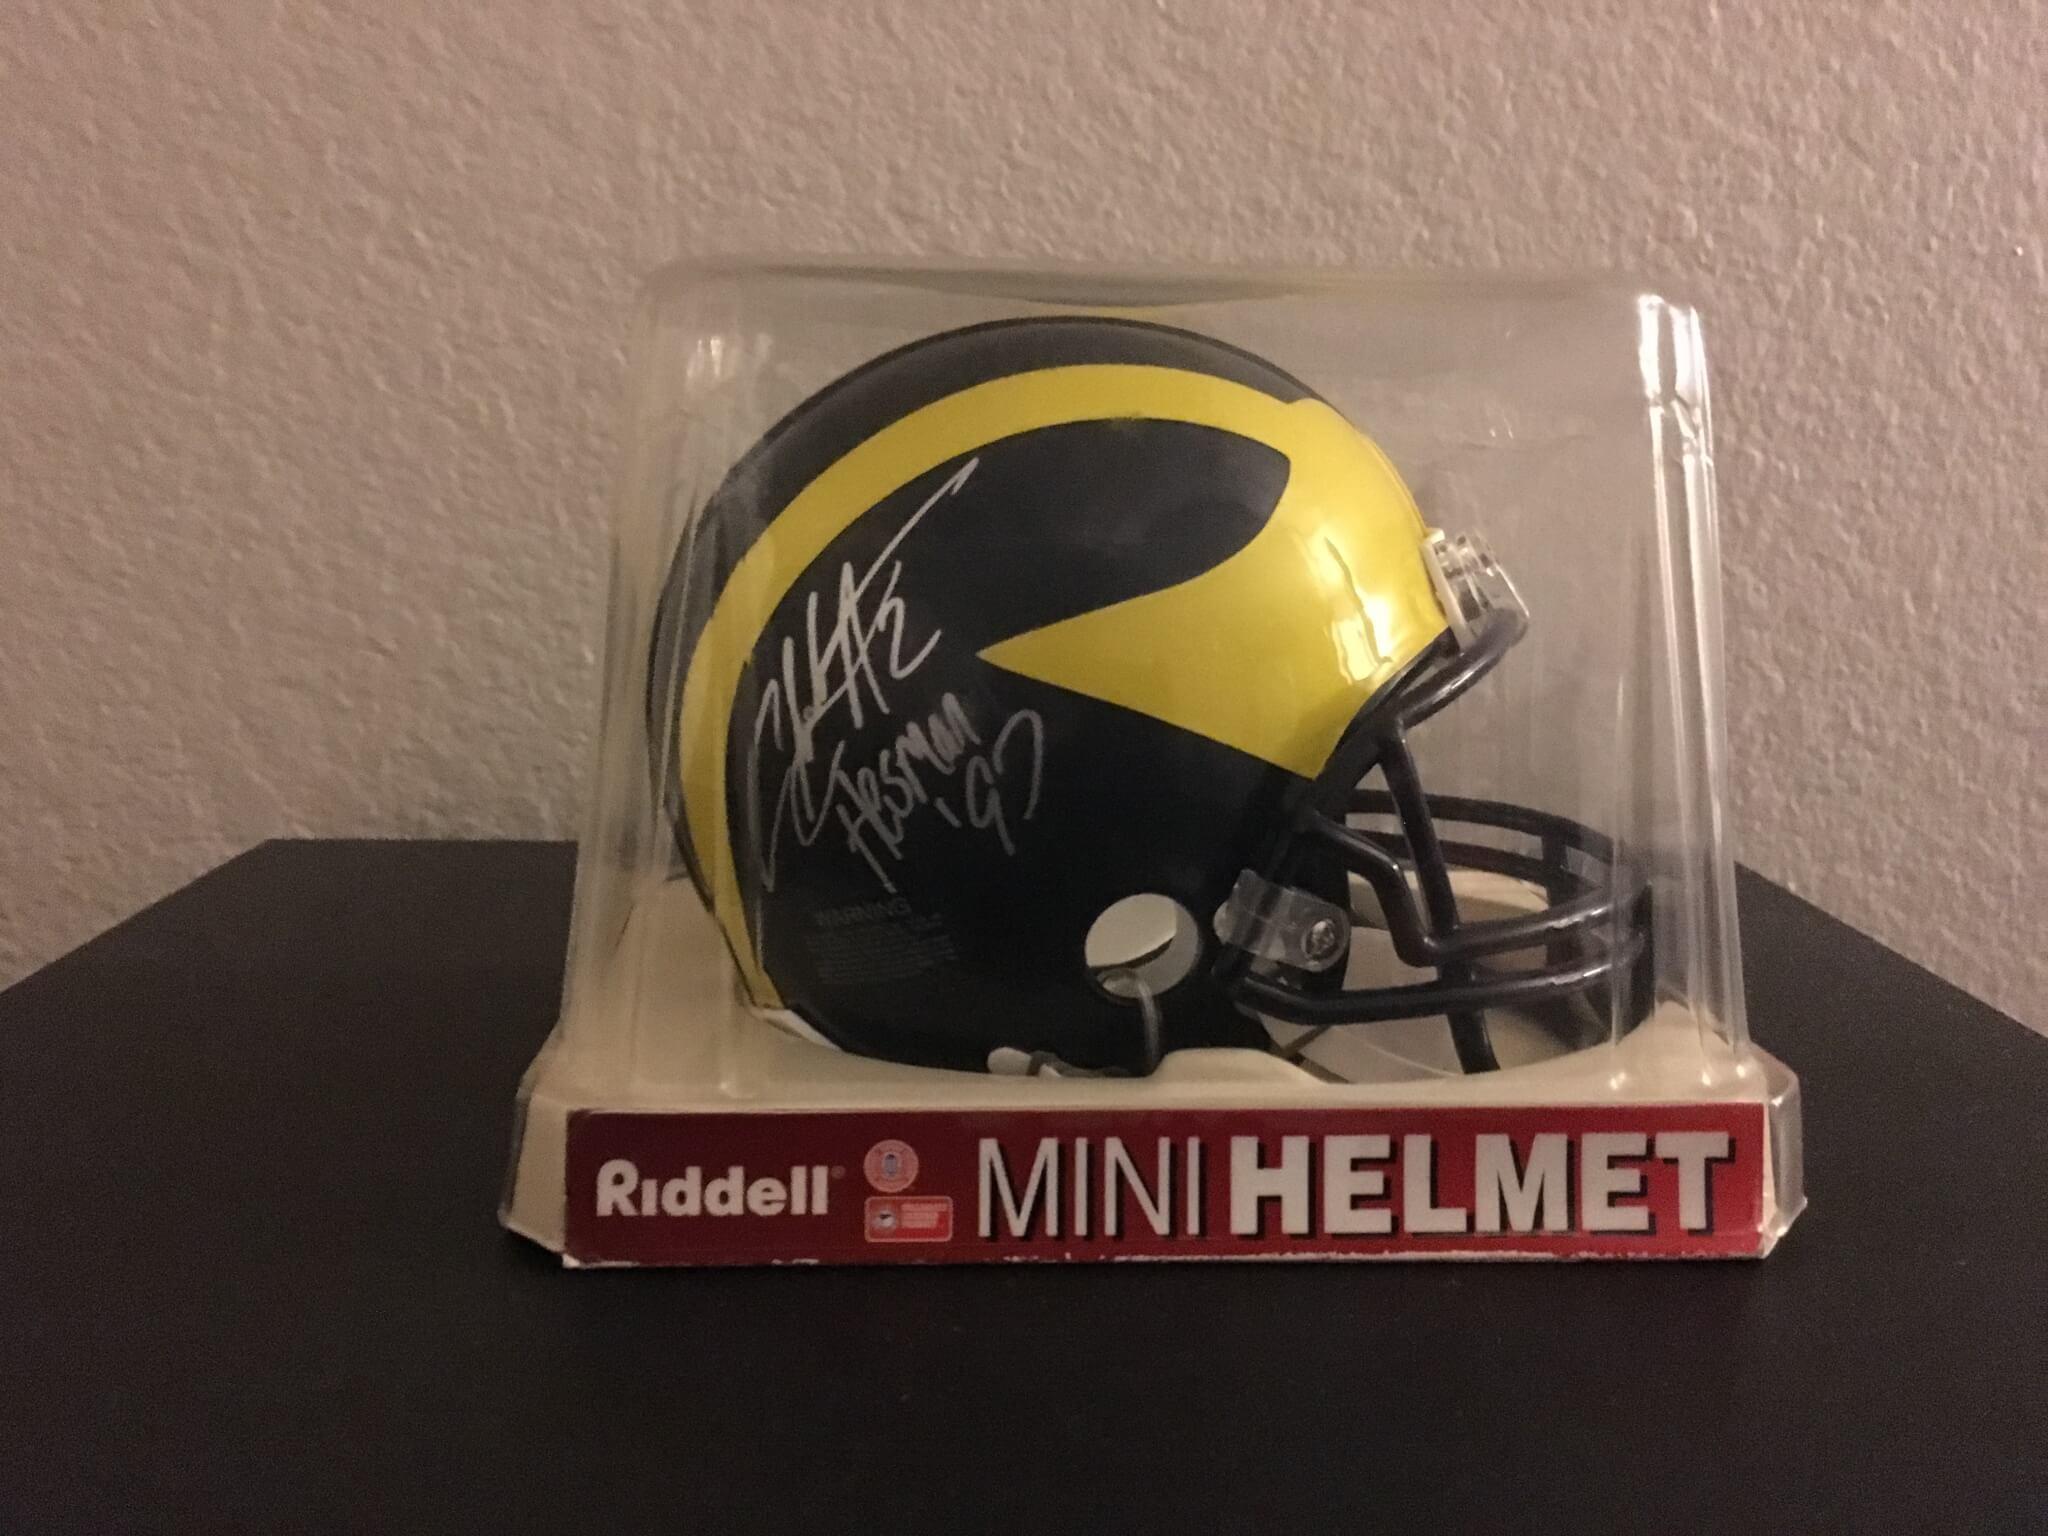 650bdb976 Charles Woodson autographed mini helmet | Memorabilia Expert